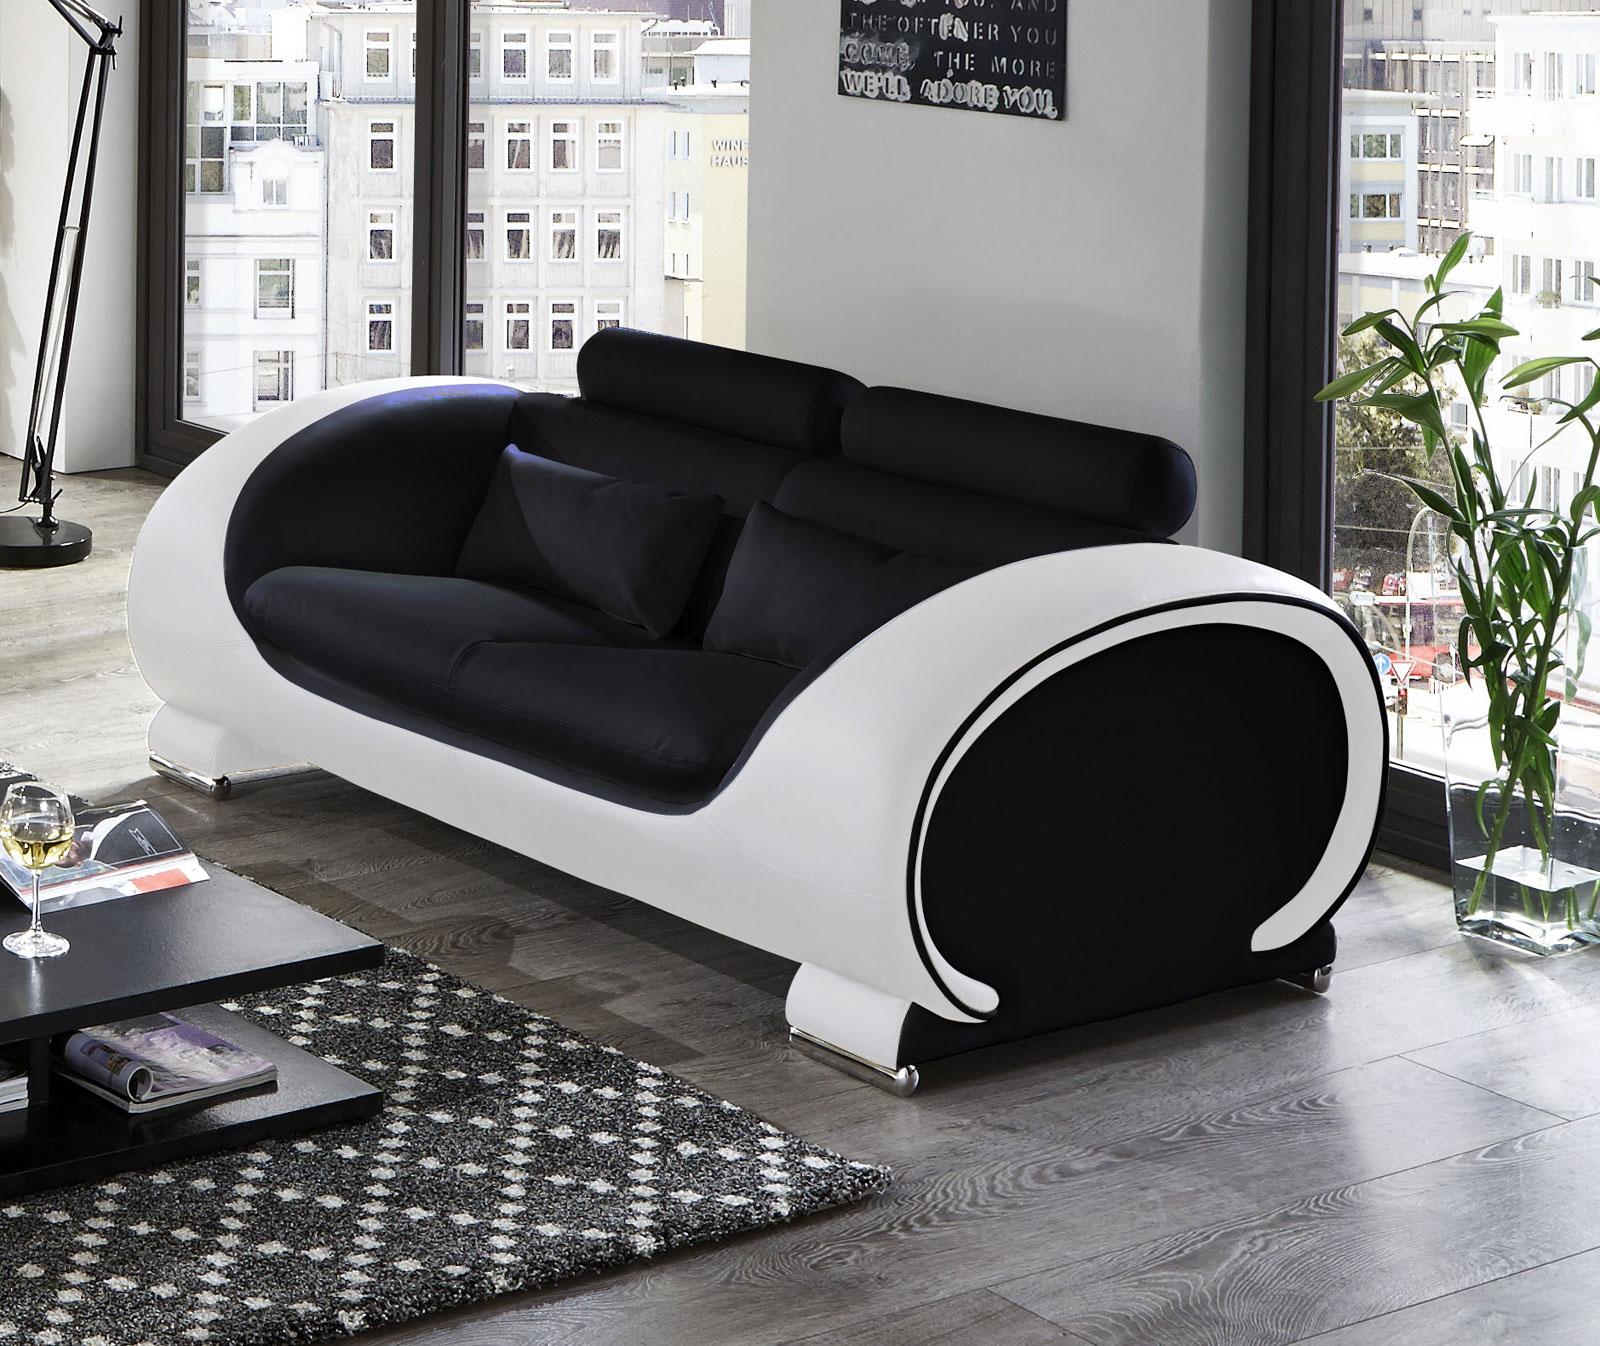 sam sofa garnitur 3tlg in schwarz wei vigo 3 2 1. Black Bedroom Furniture Sets. Home Design Ideas